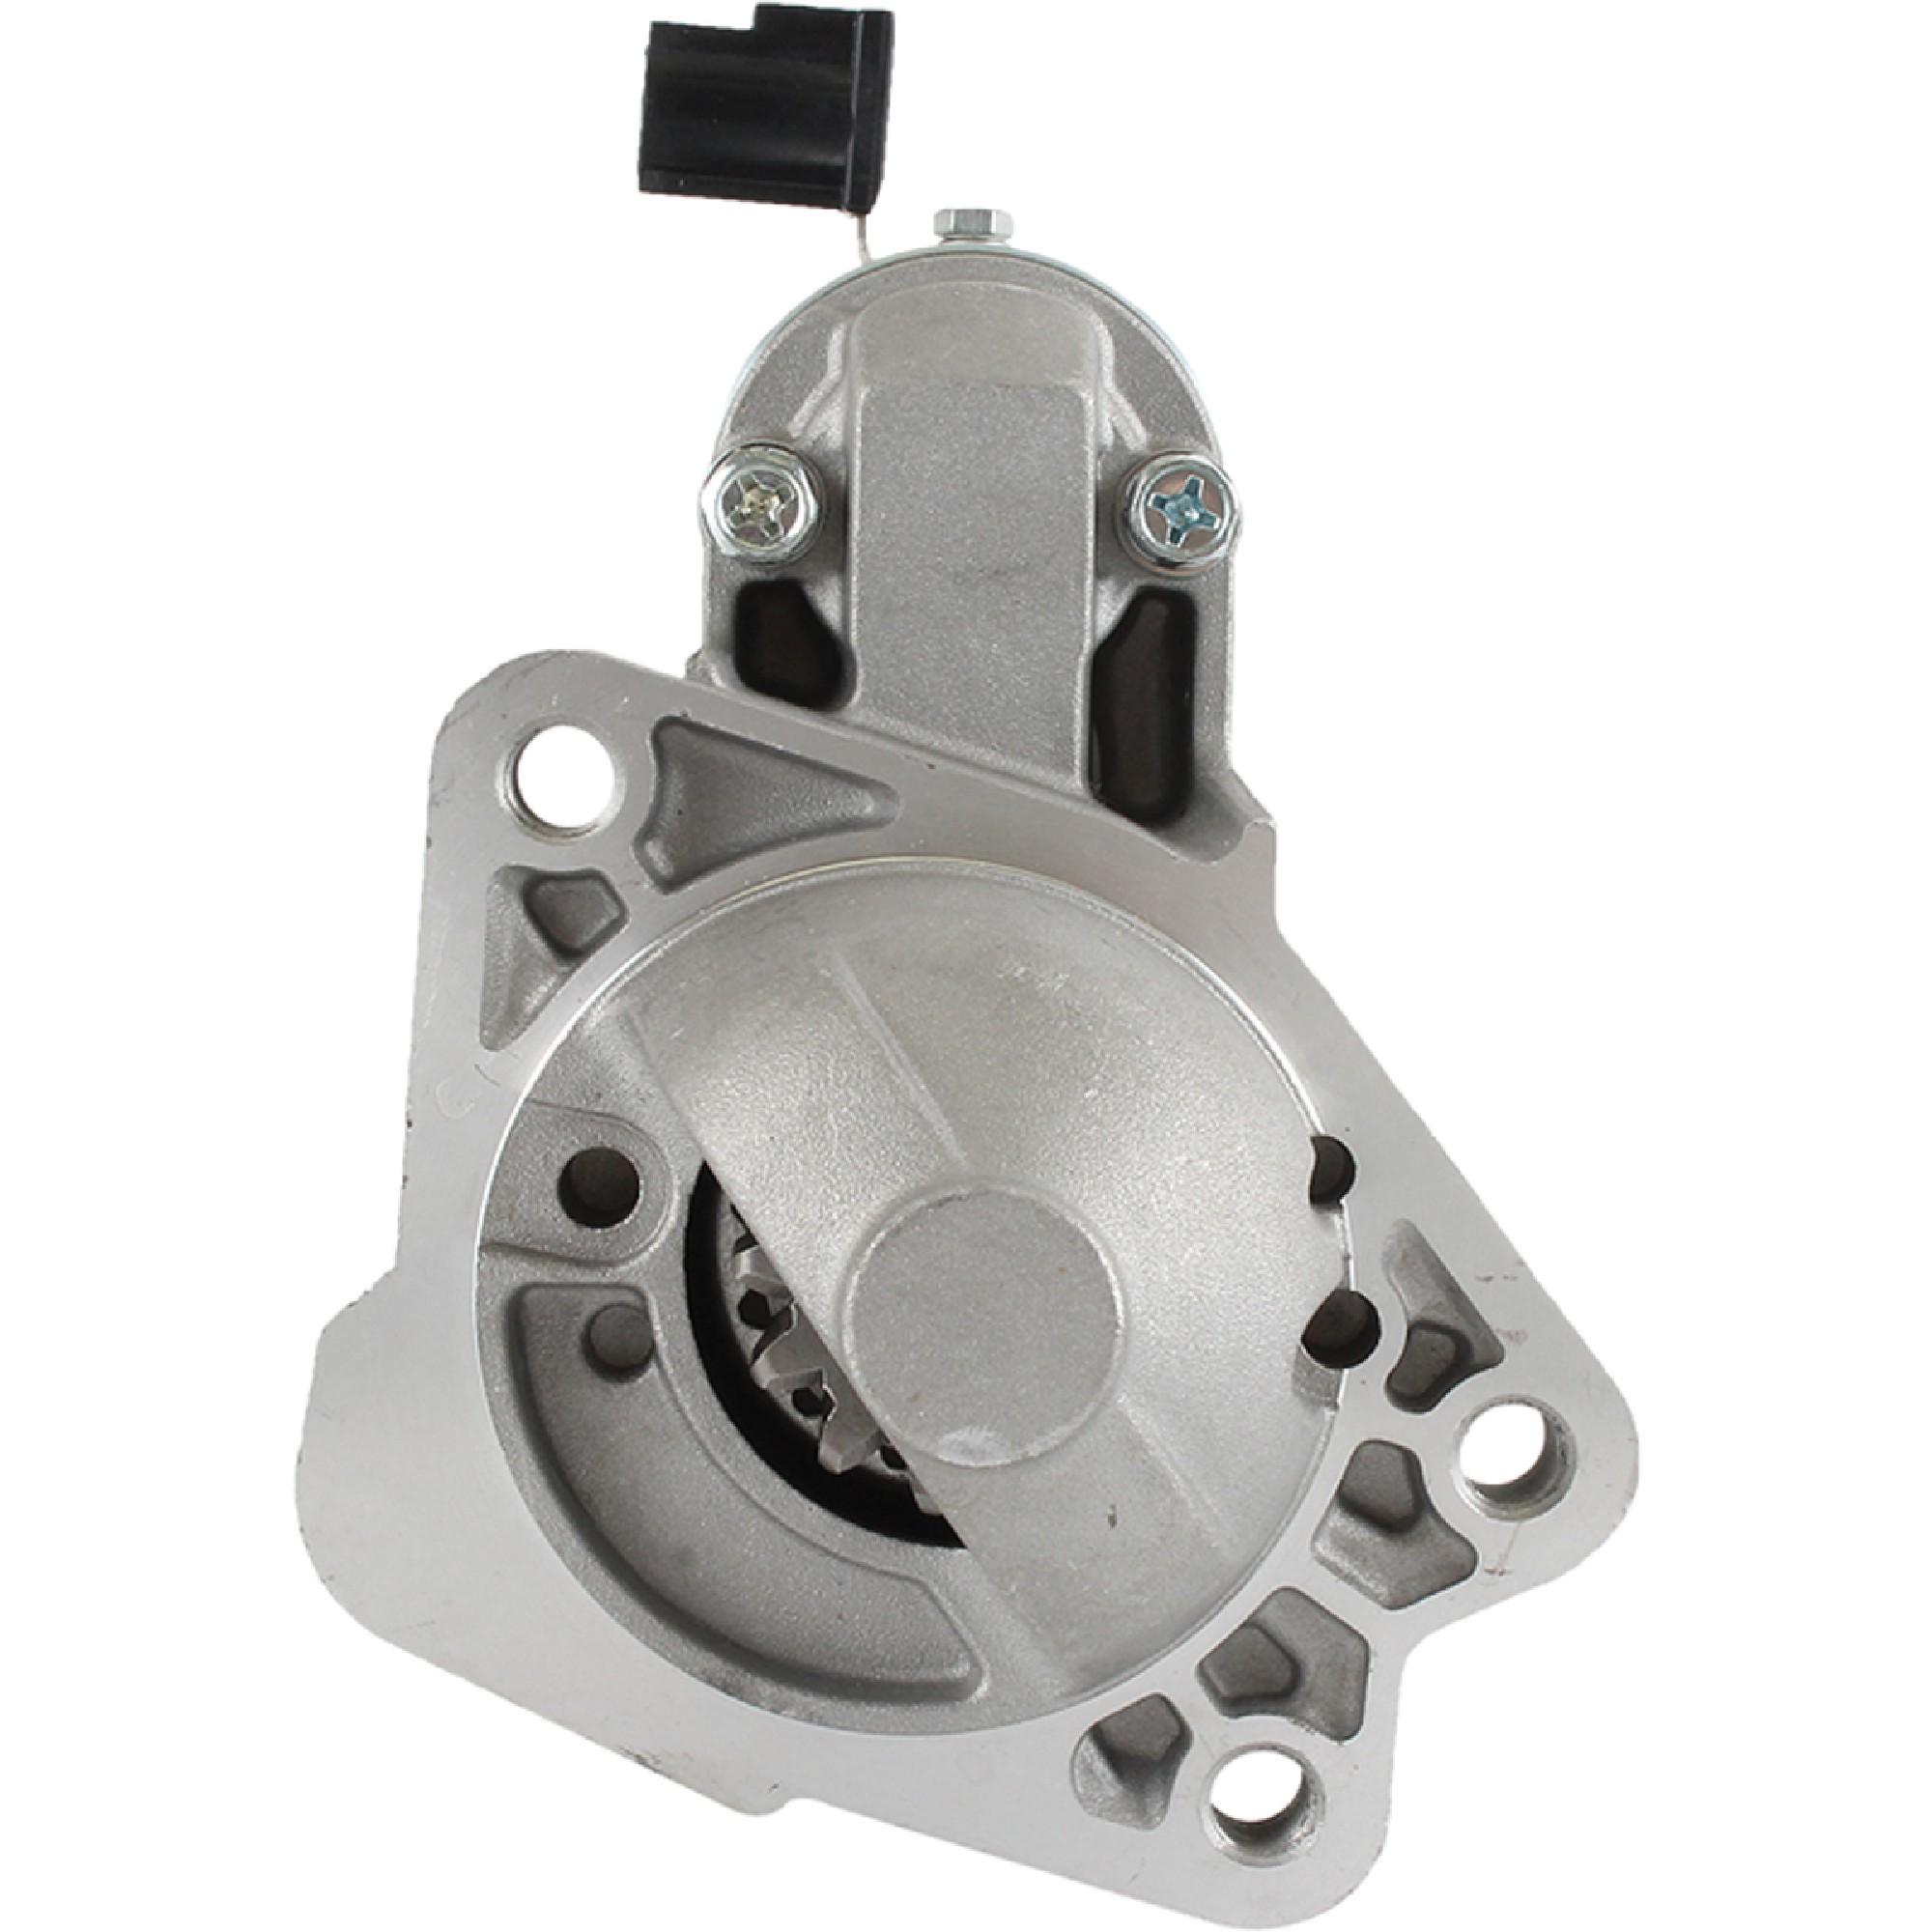 New Starter For Mazda 2 11-12 12V 19197 103-5315 LRS03884 ZYF3-18-400 M0T38271